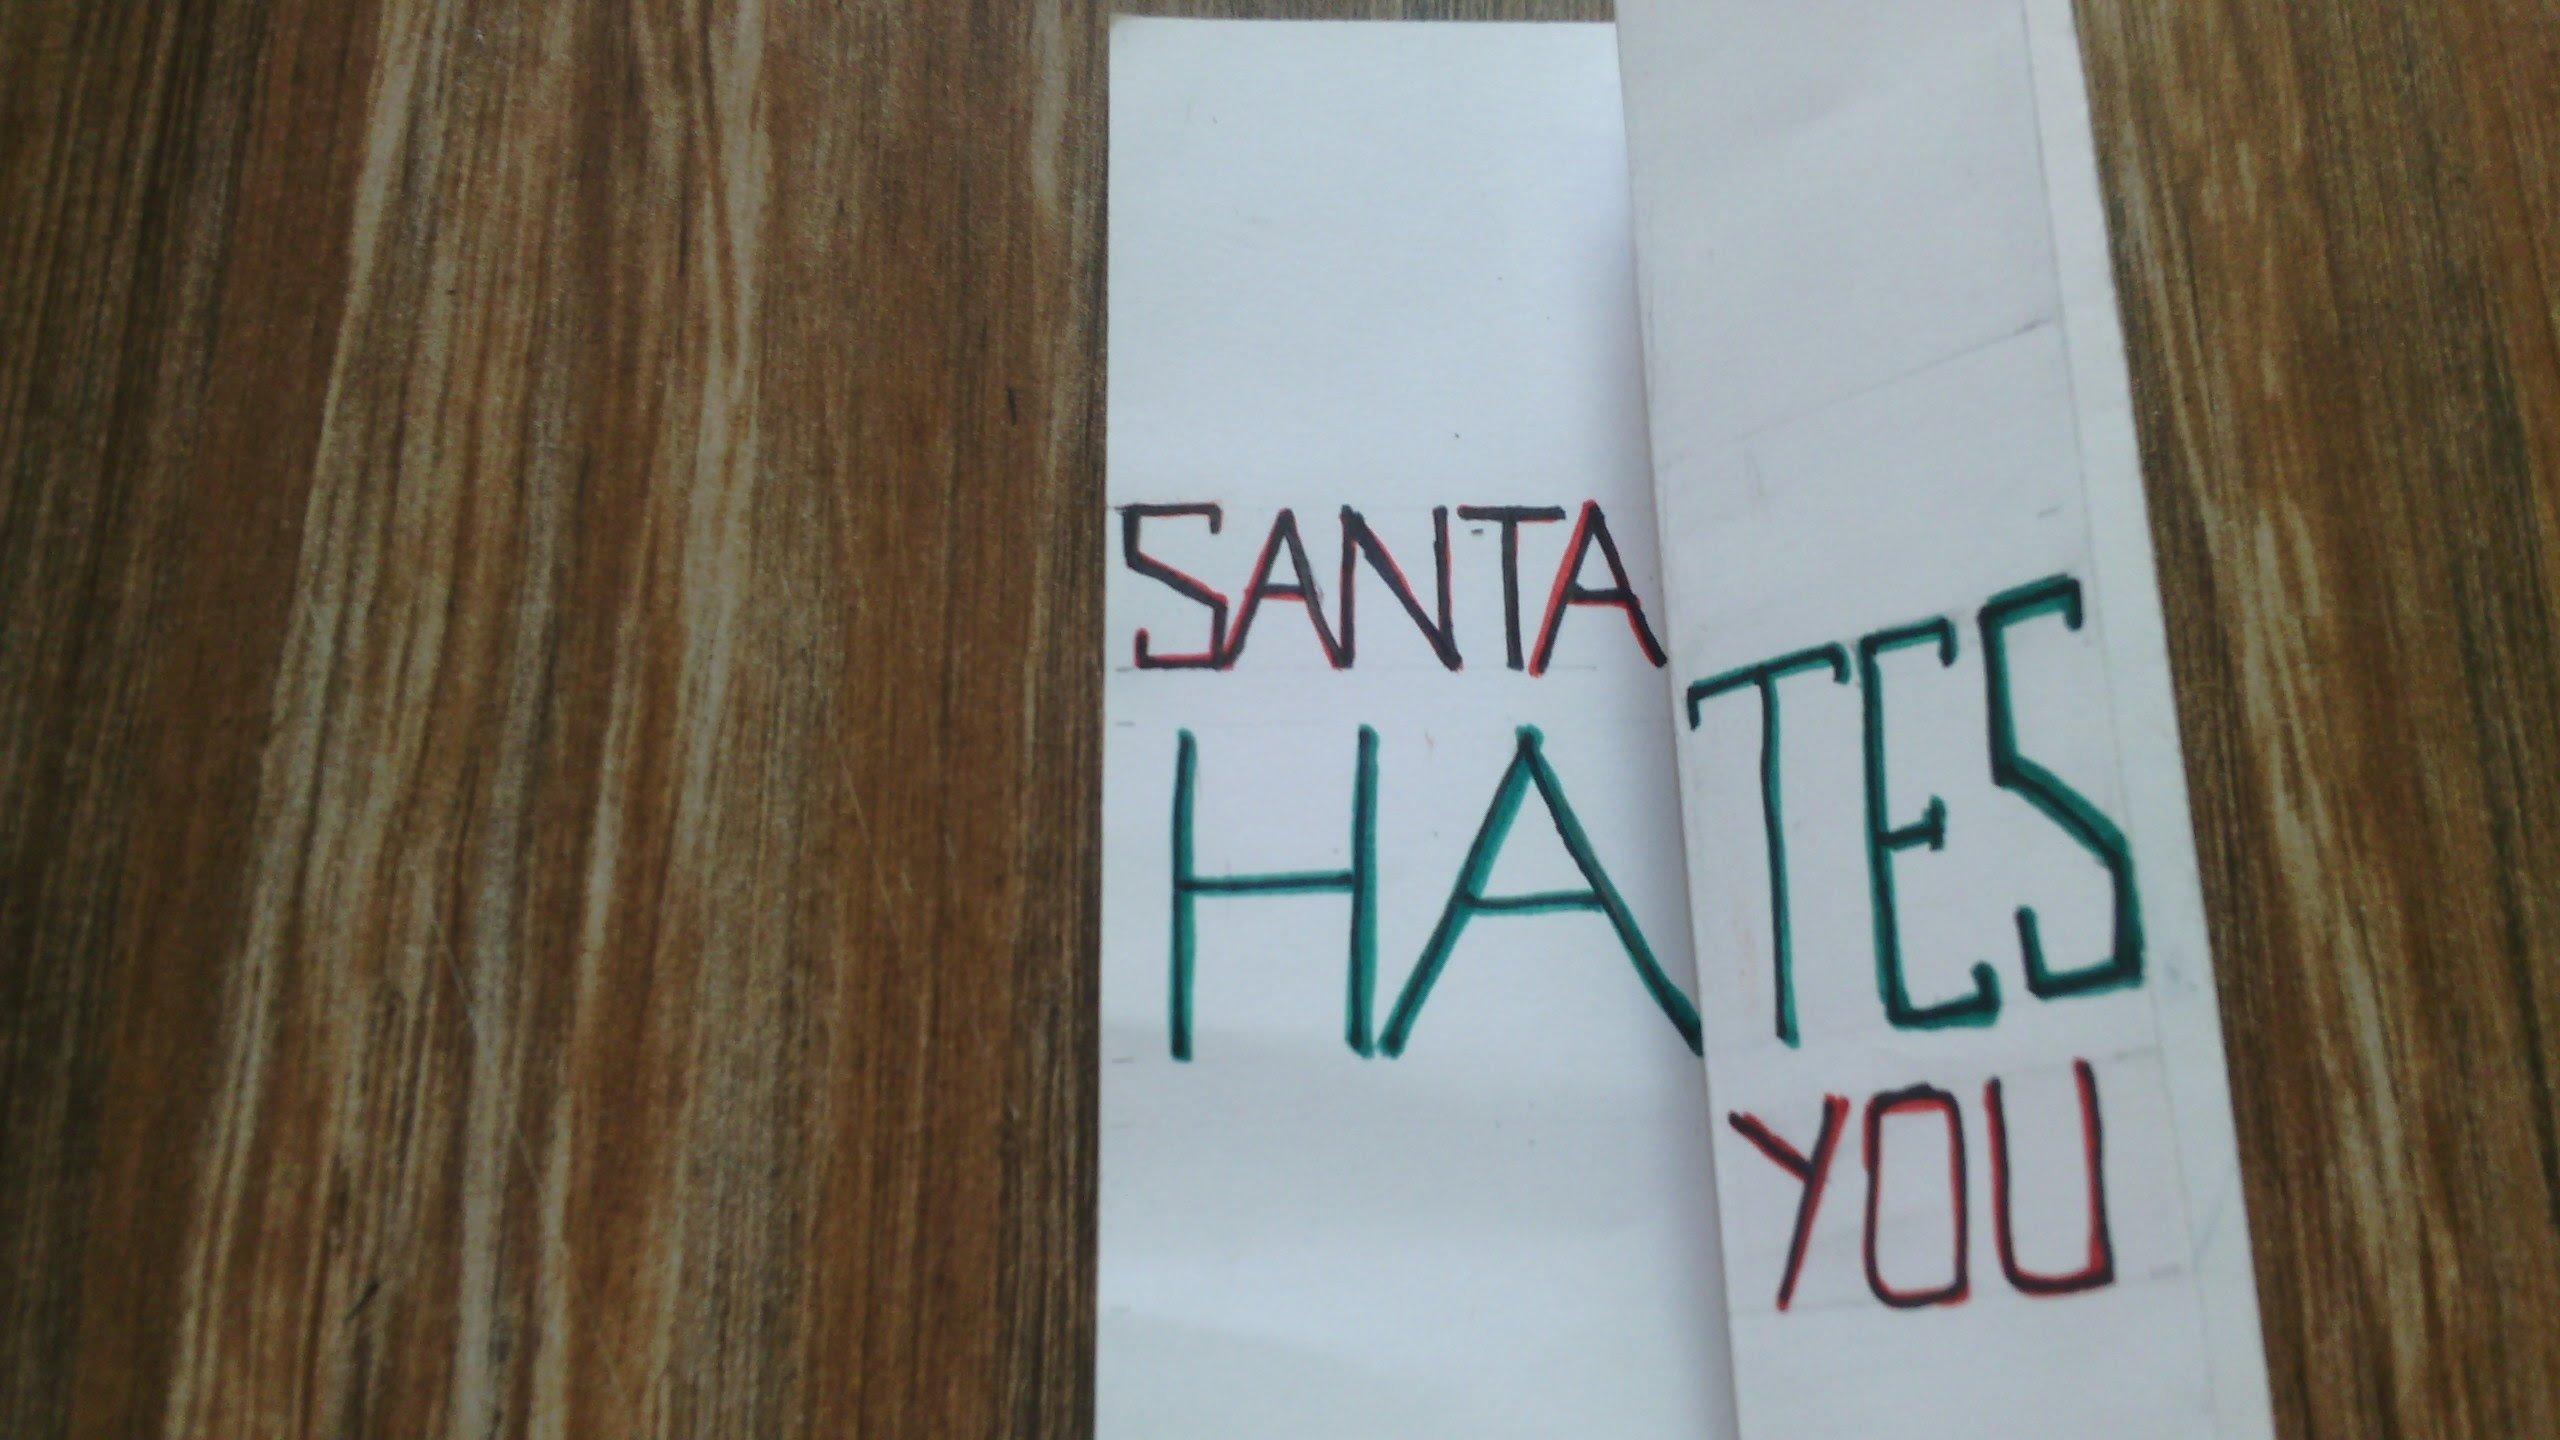 10 Trendy Cute Christmas Card Ideas For Kids funny and cute christmas card ideas youtube 2021